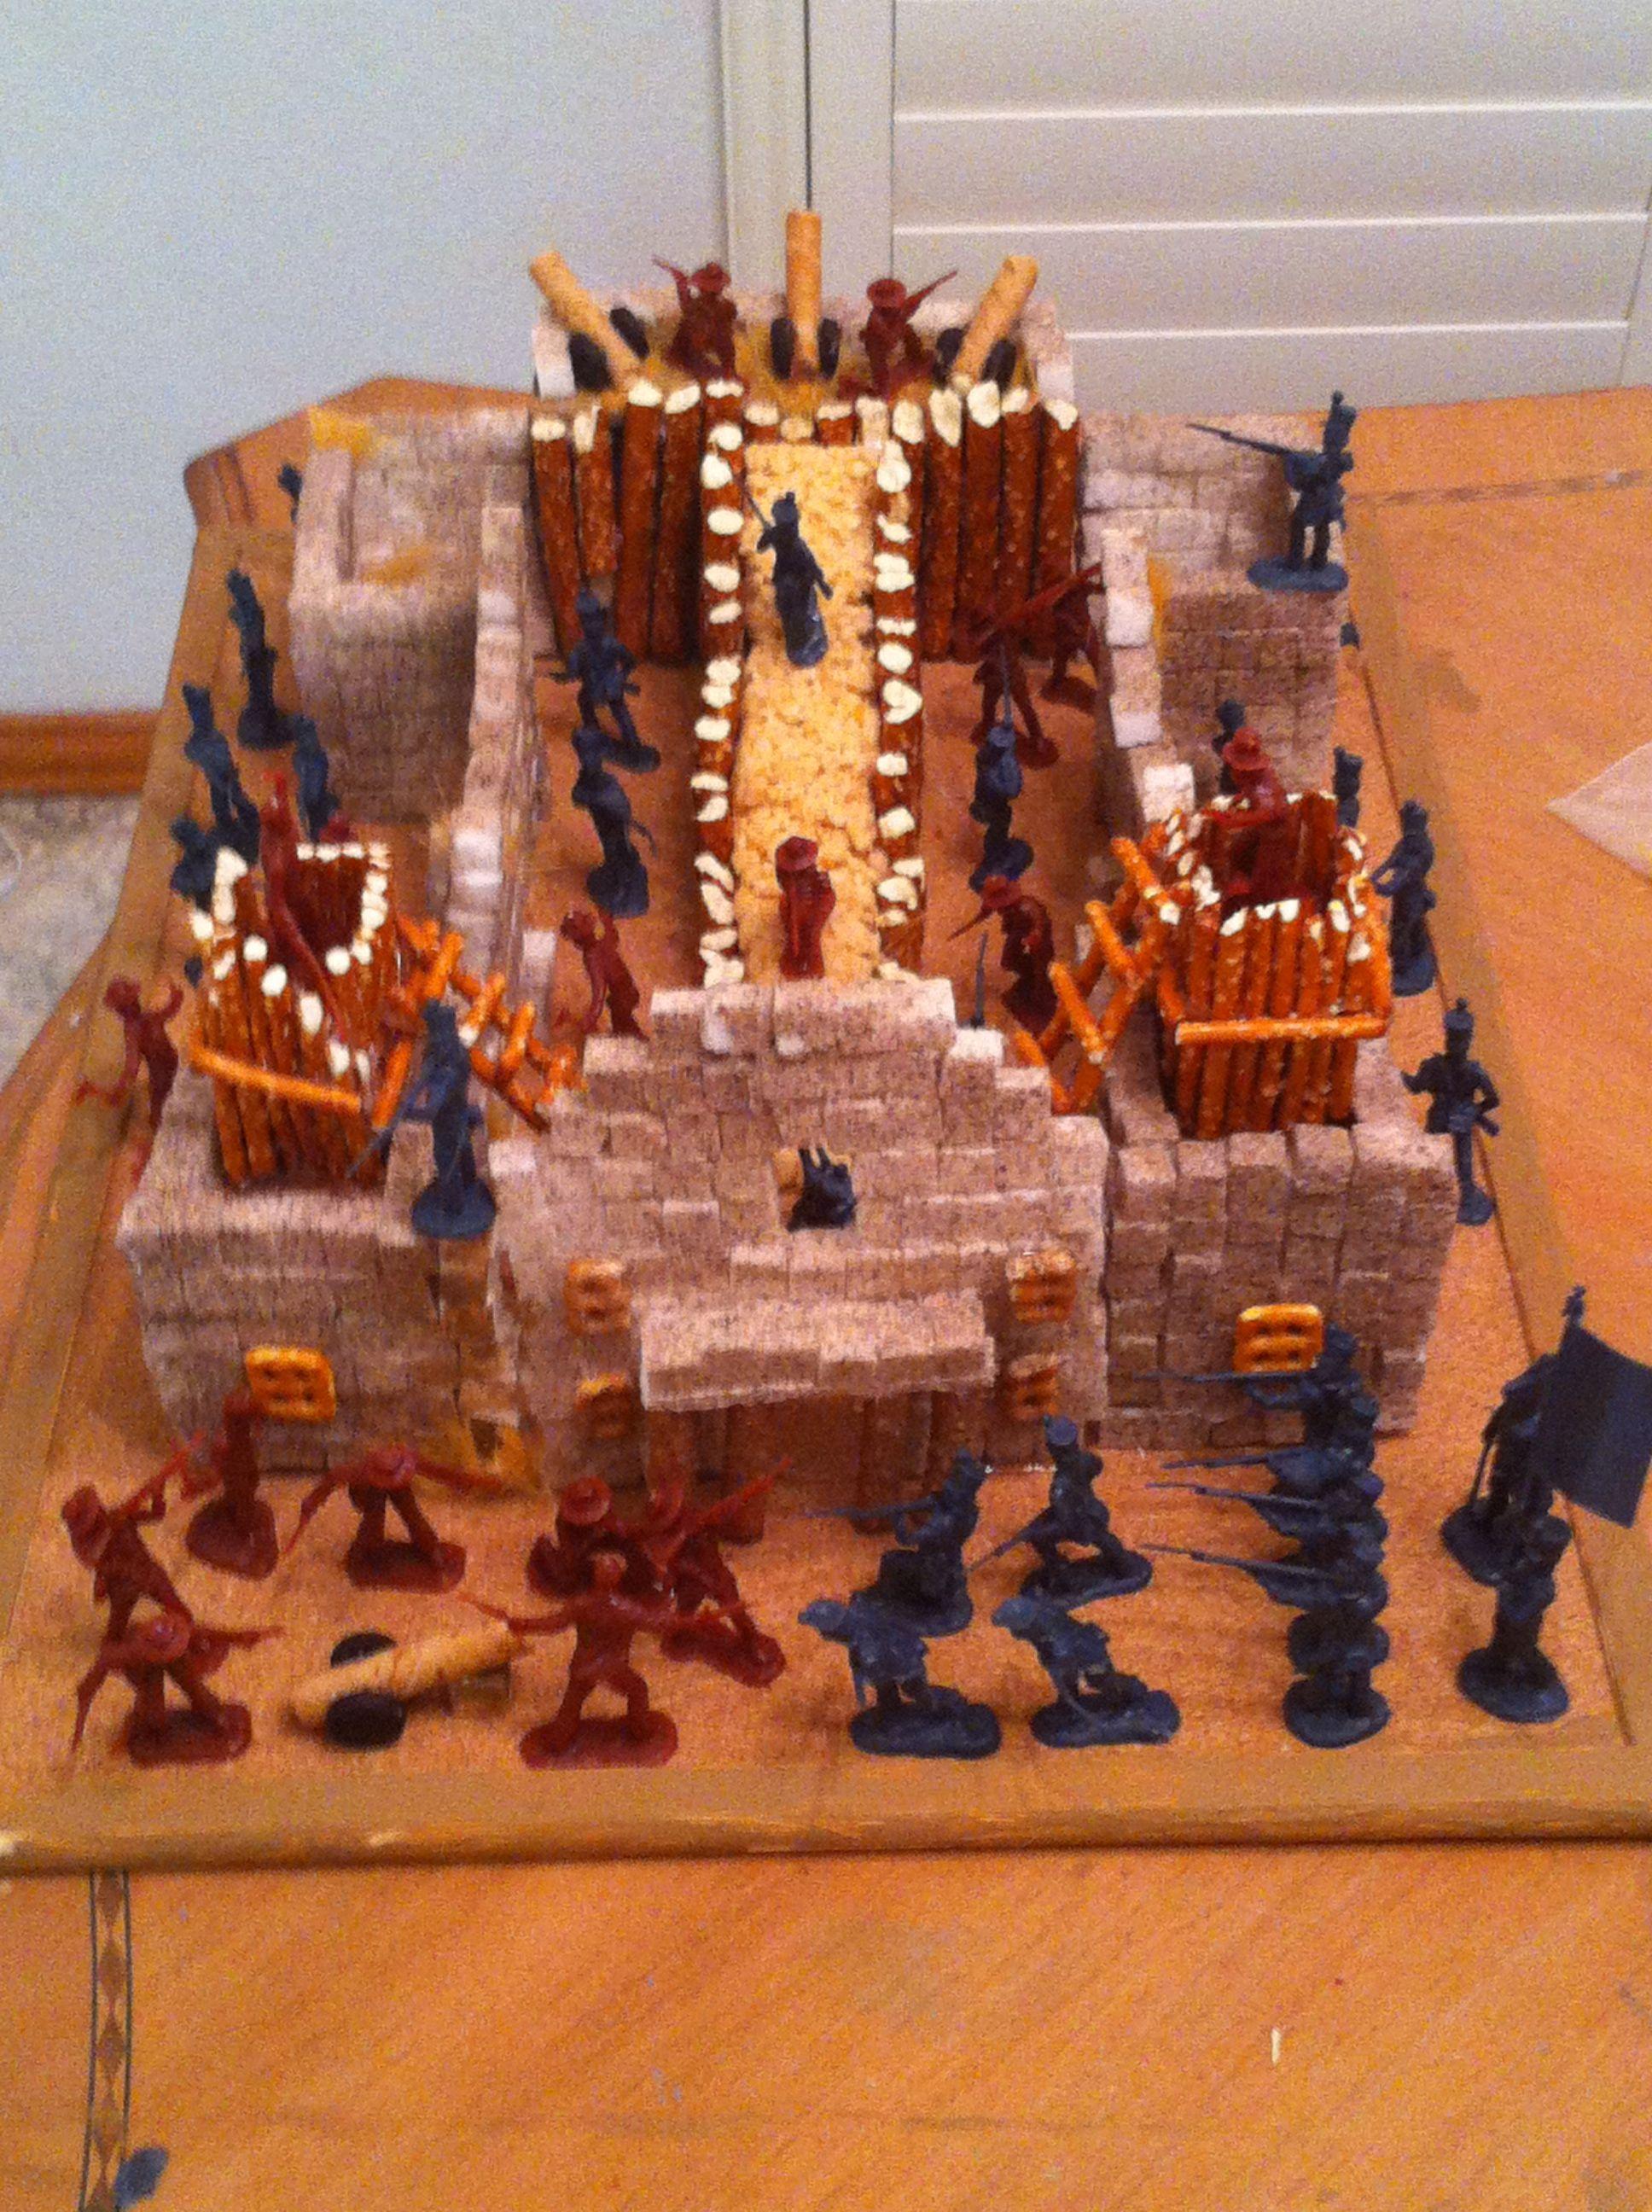 Model Of The Alamo Used Sugar Cubes Pretzels Rice